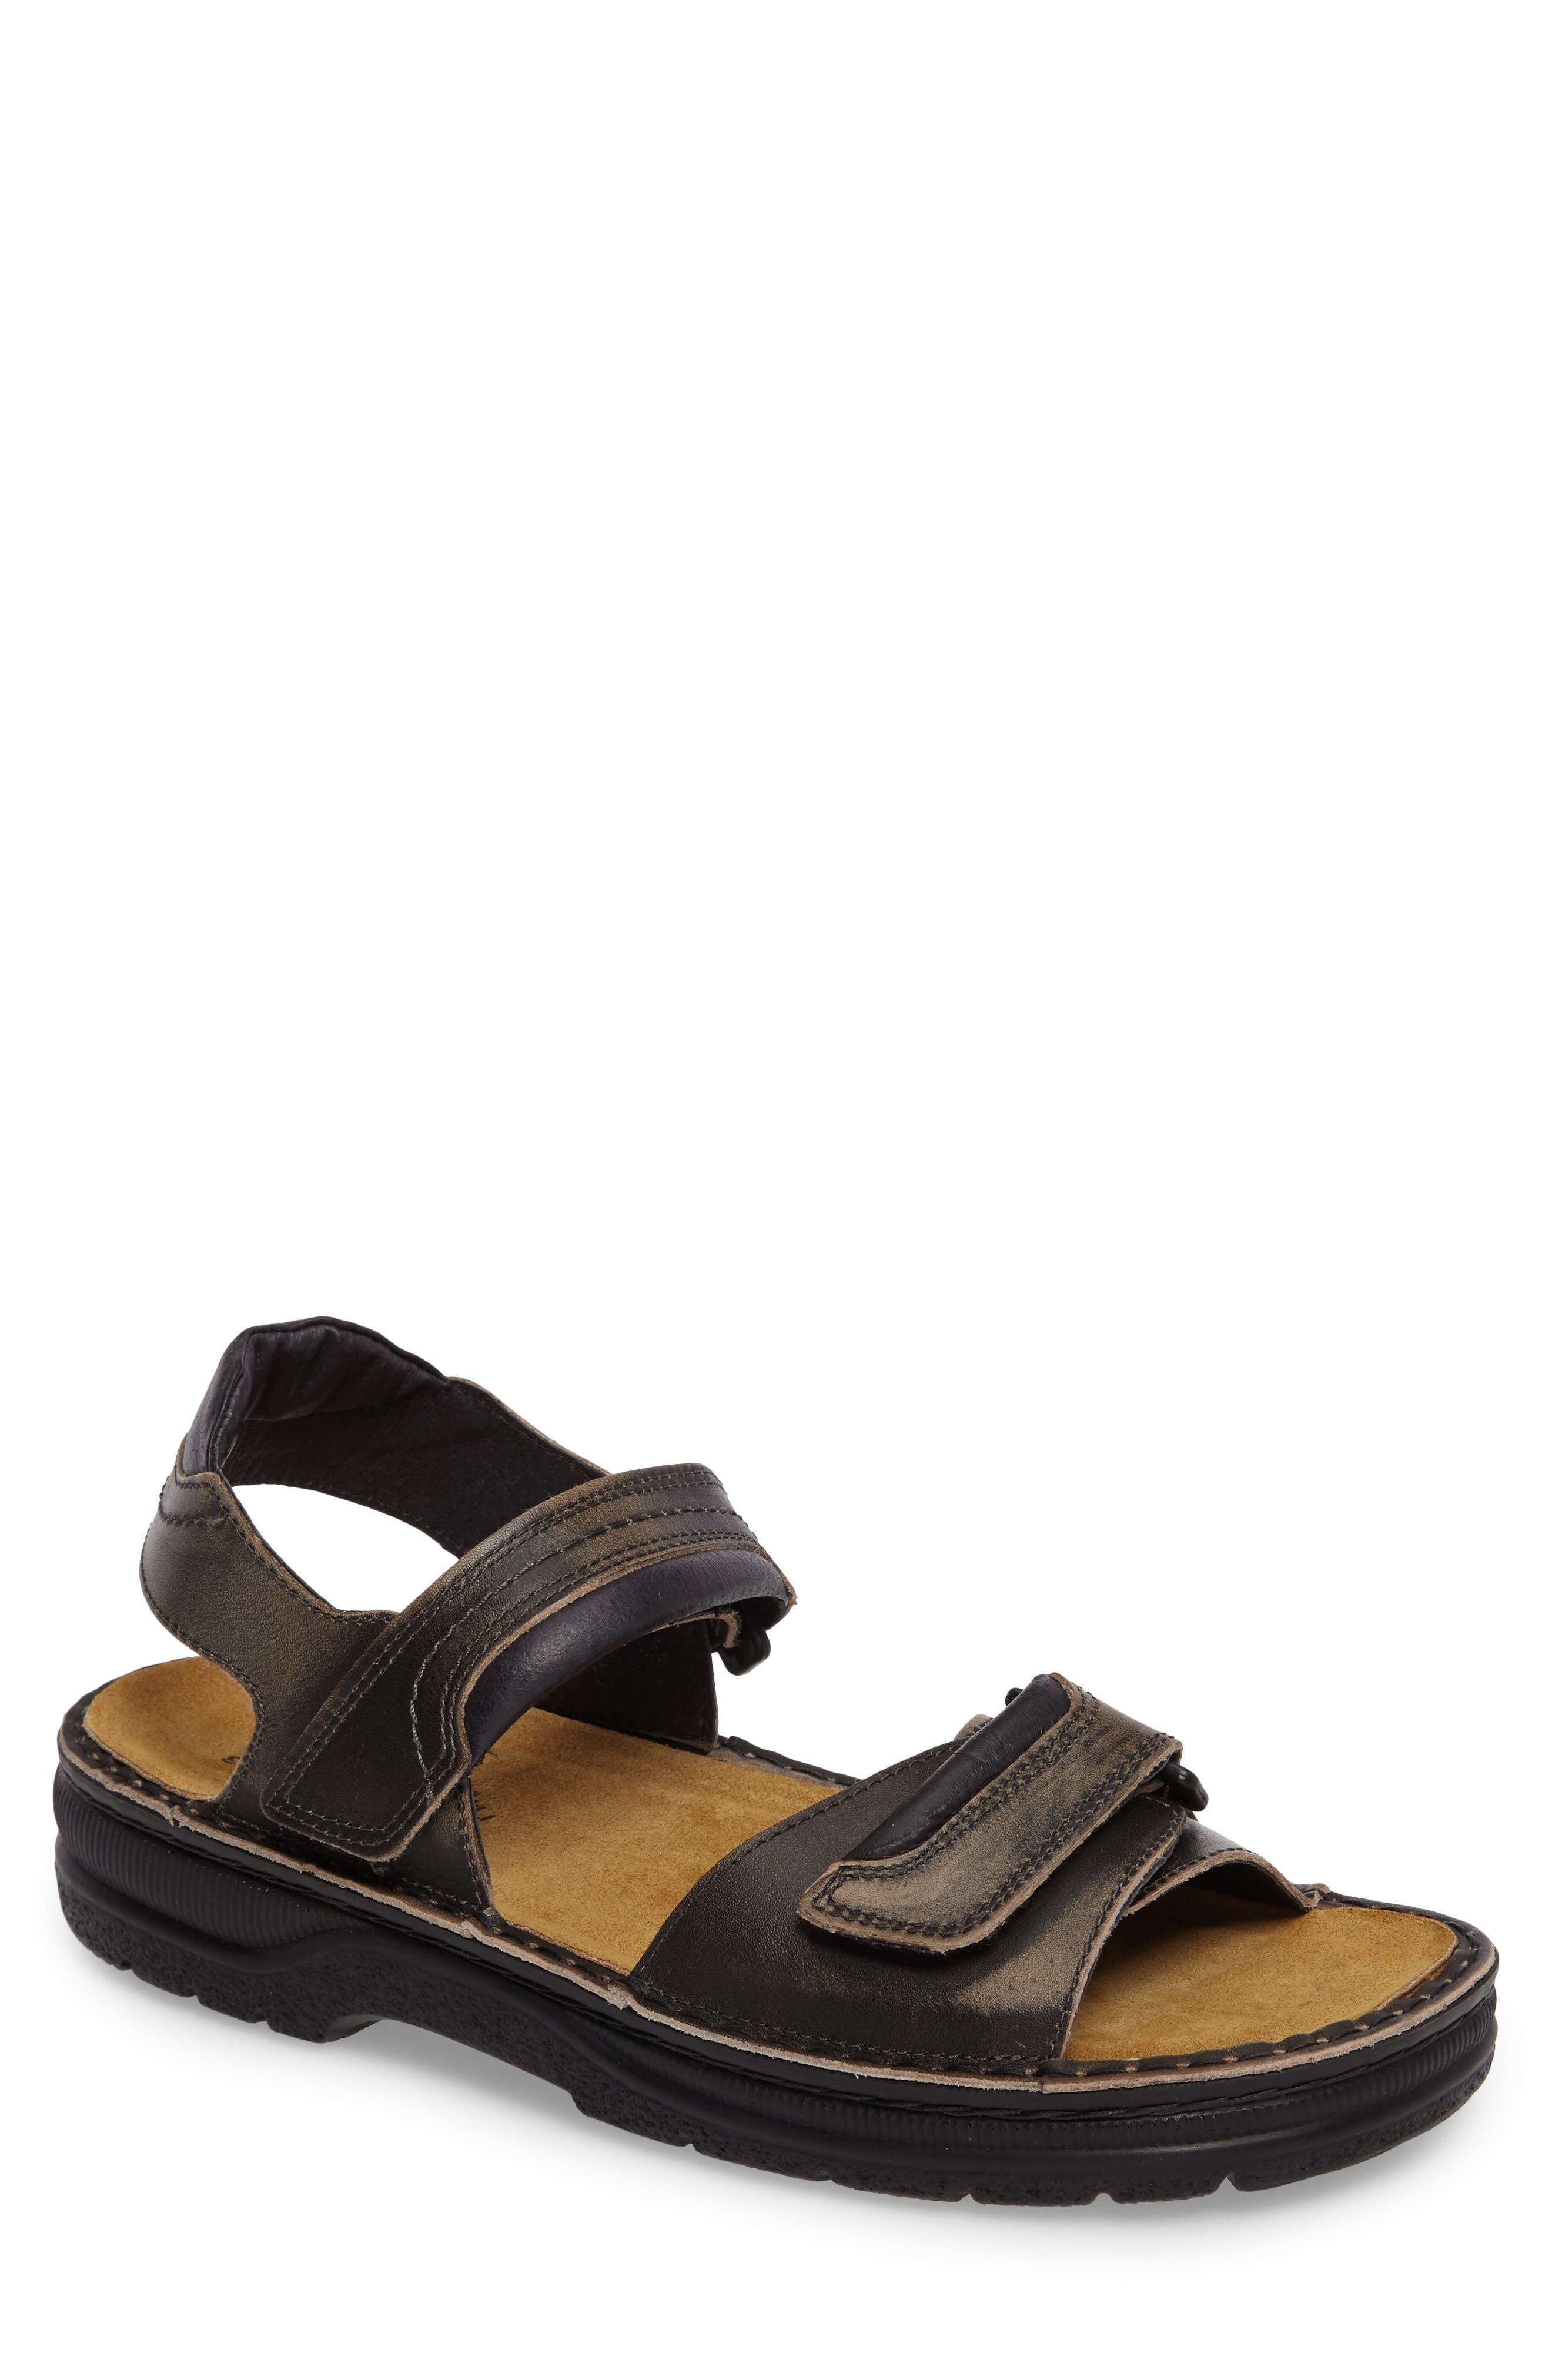 Lappland Sandal,                         Main,                         color, Vintage Gray Leather